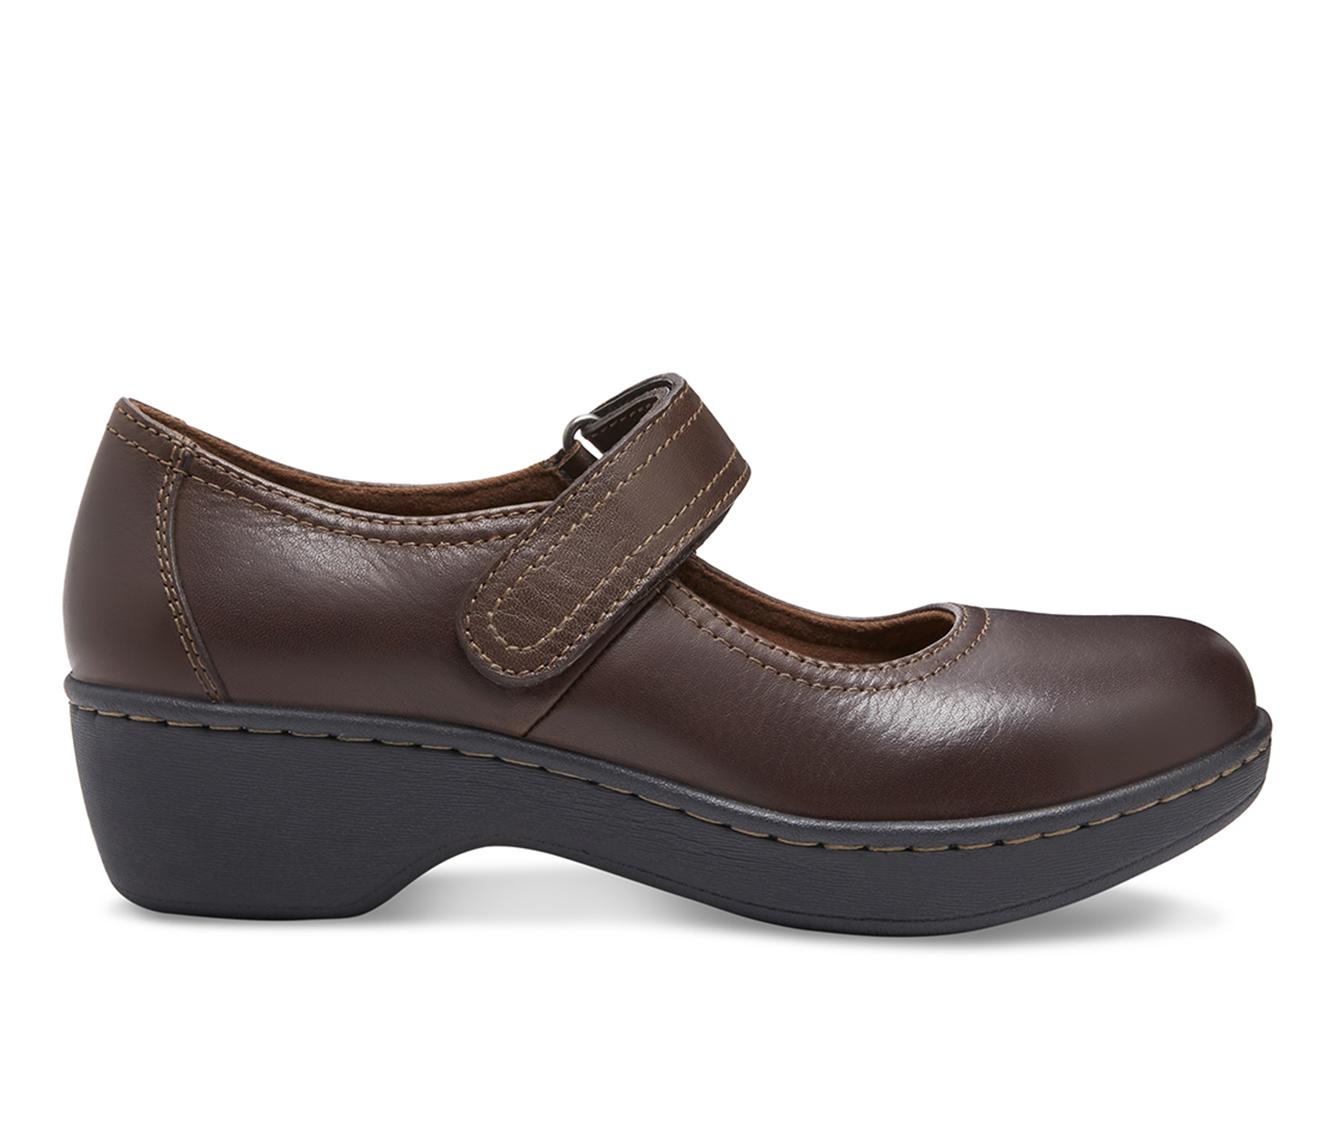 Eastland Gloria Women's Shoe (Brown Leather)